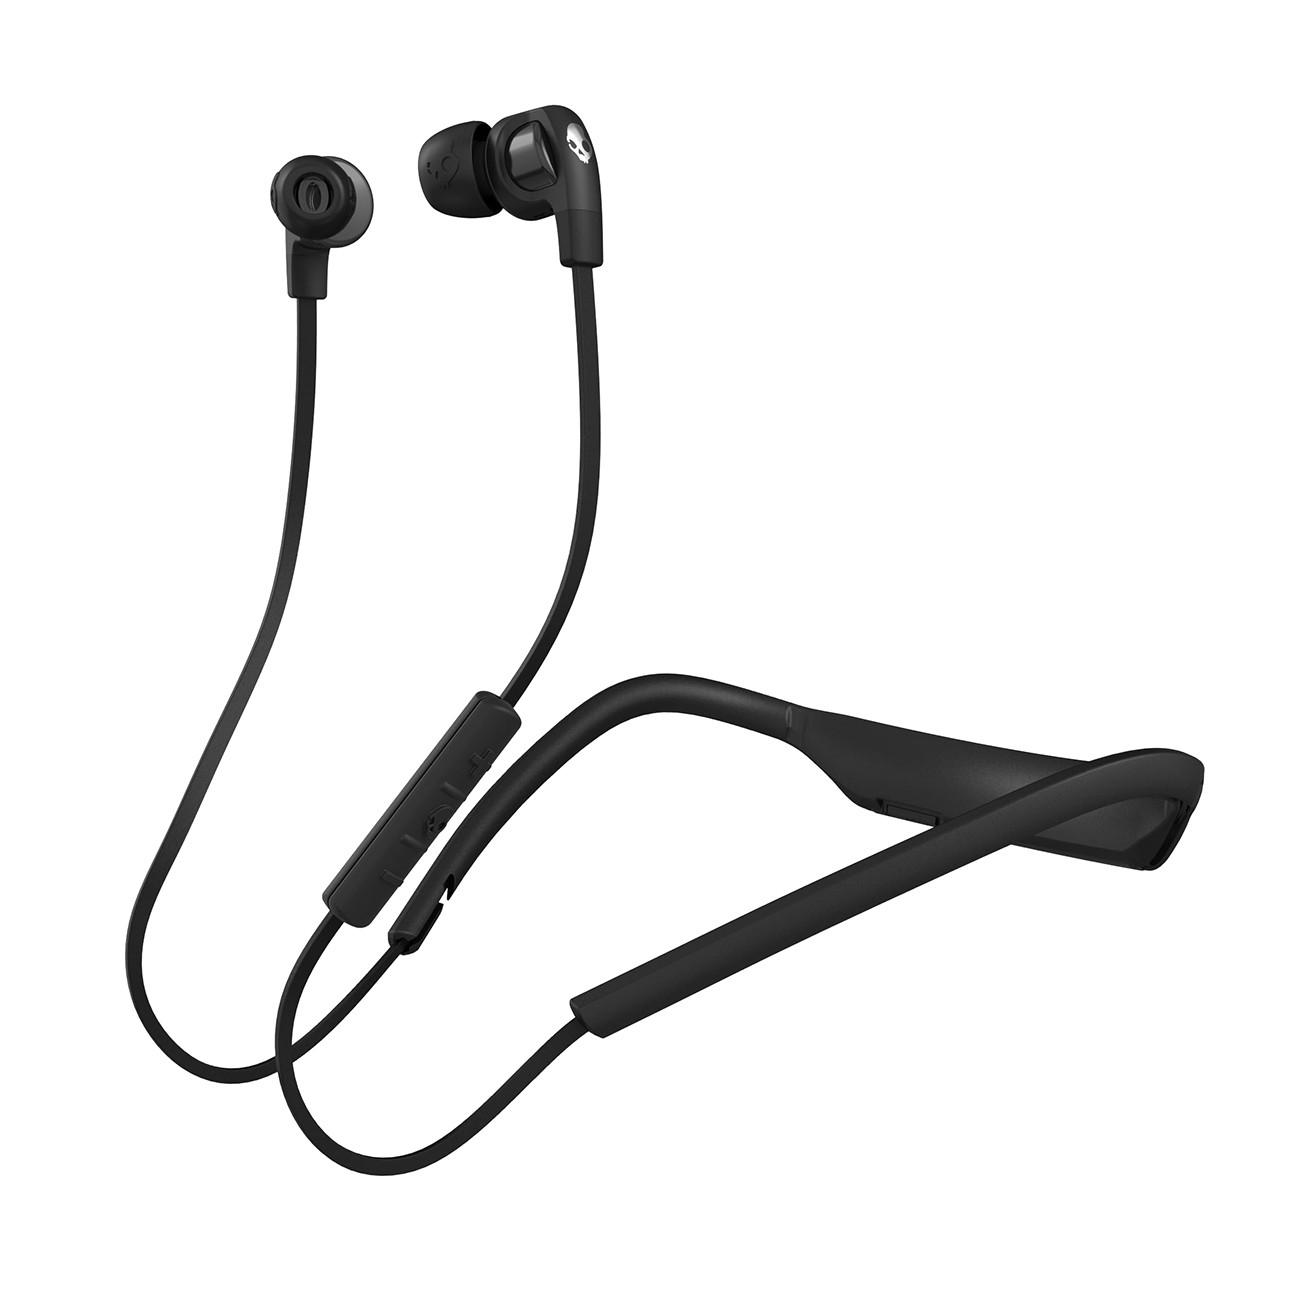 Sluchátka Skullcandy Smokin Buds 2 Wireless black/black/chrome